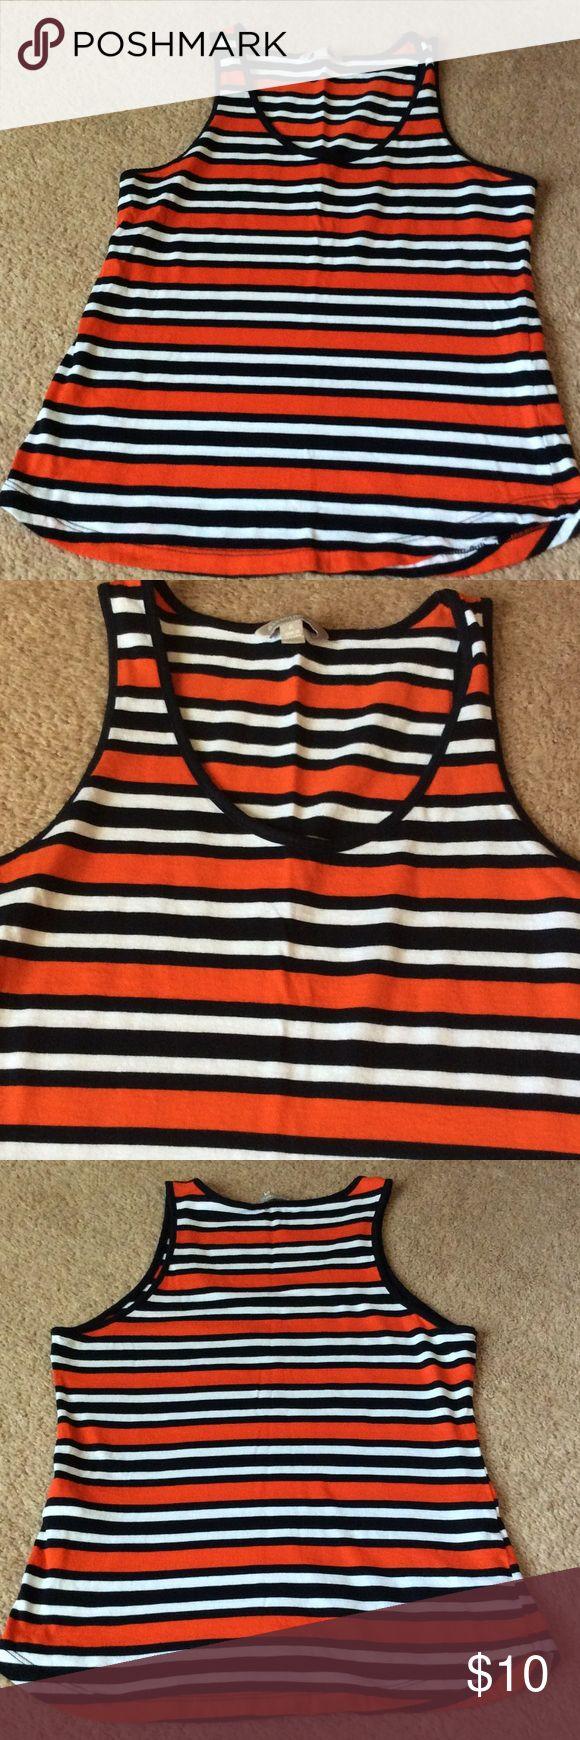 Banana Republic ladies Small Petite shirt stripes Machine washable Banana Republic Tops